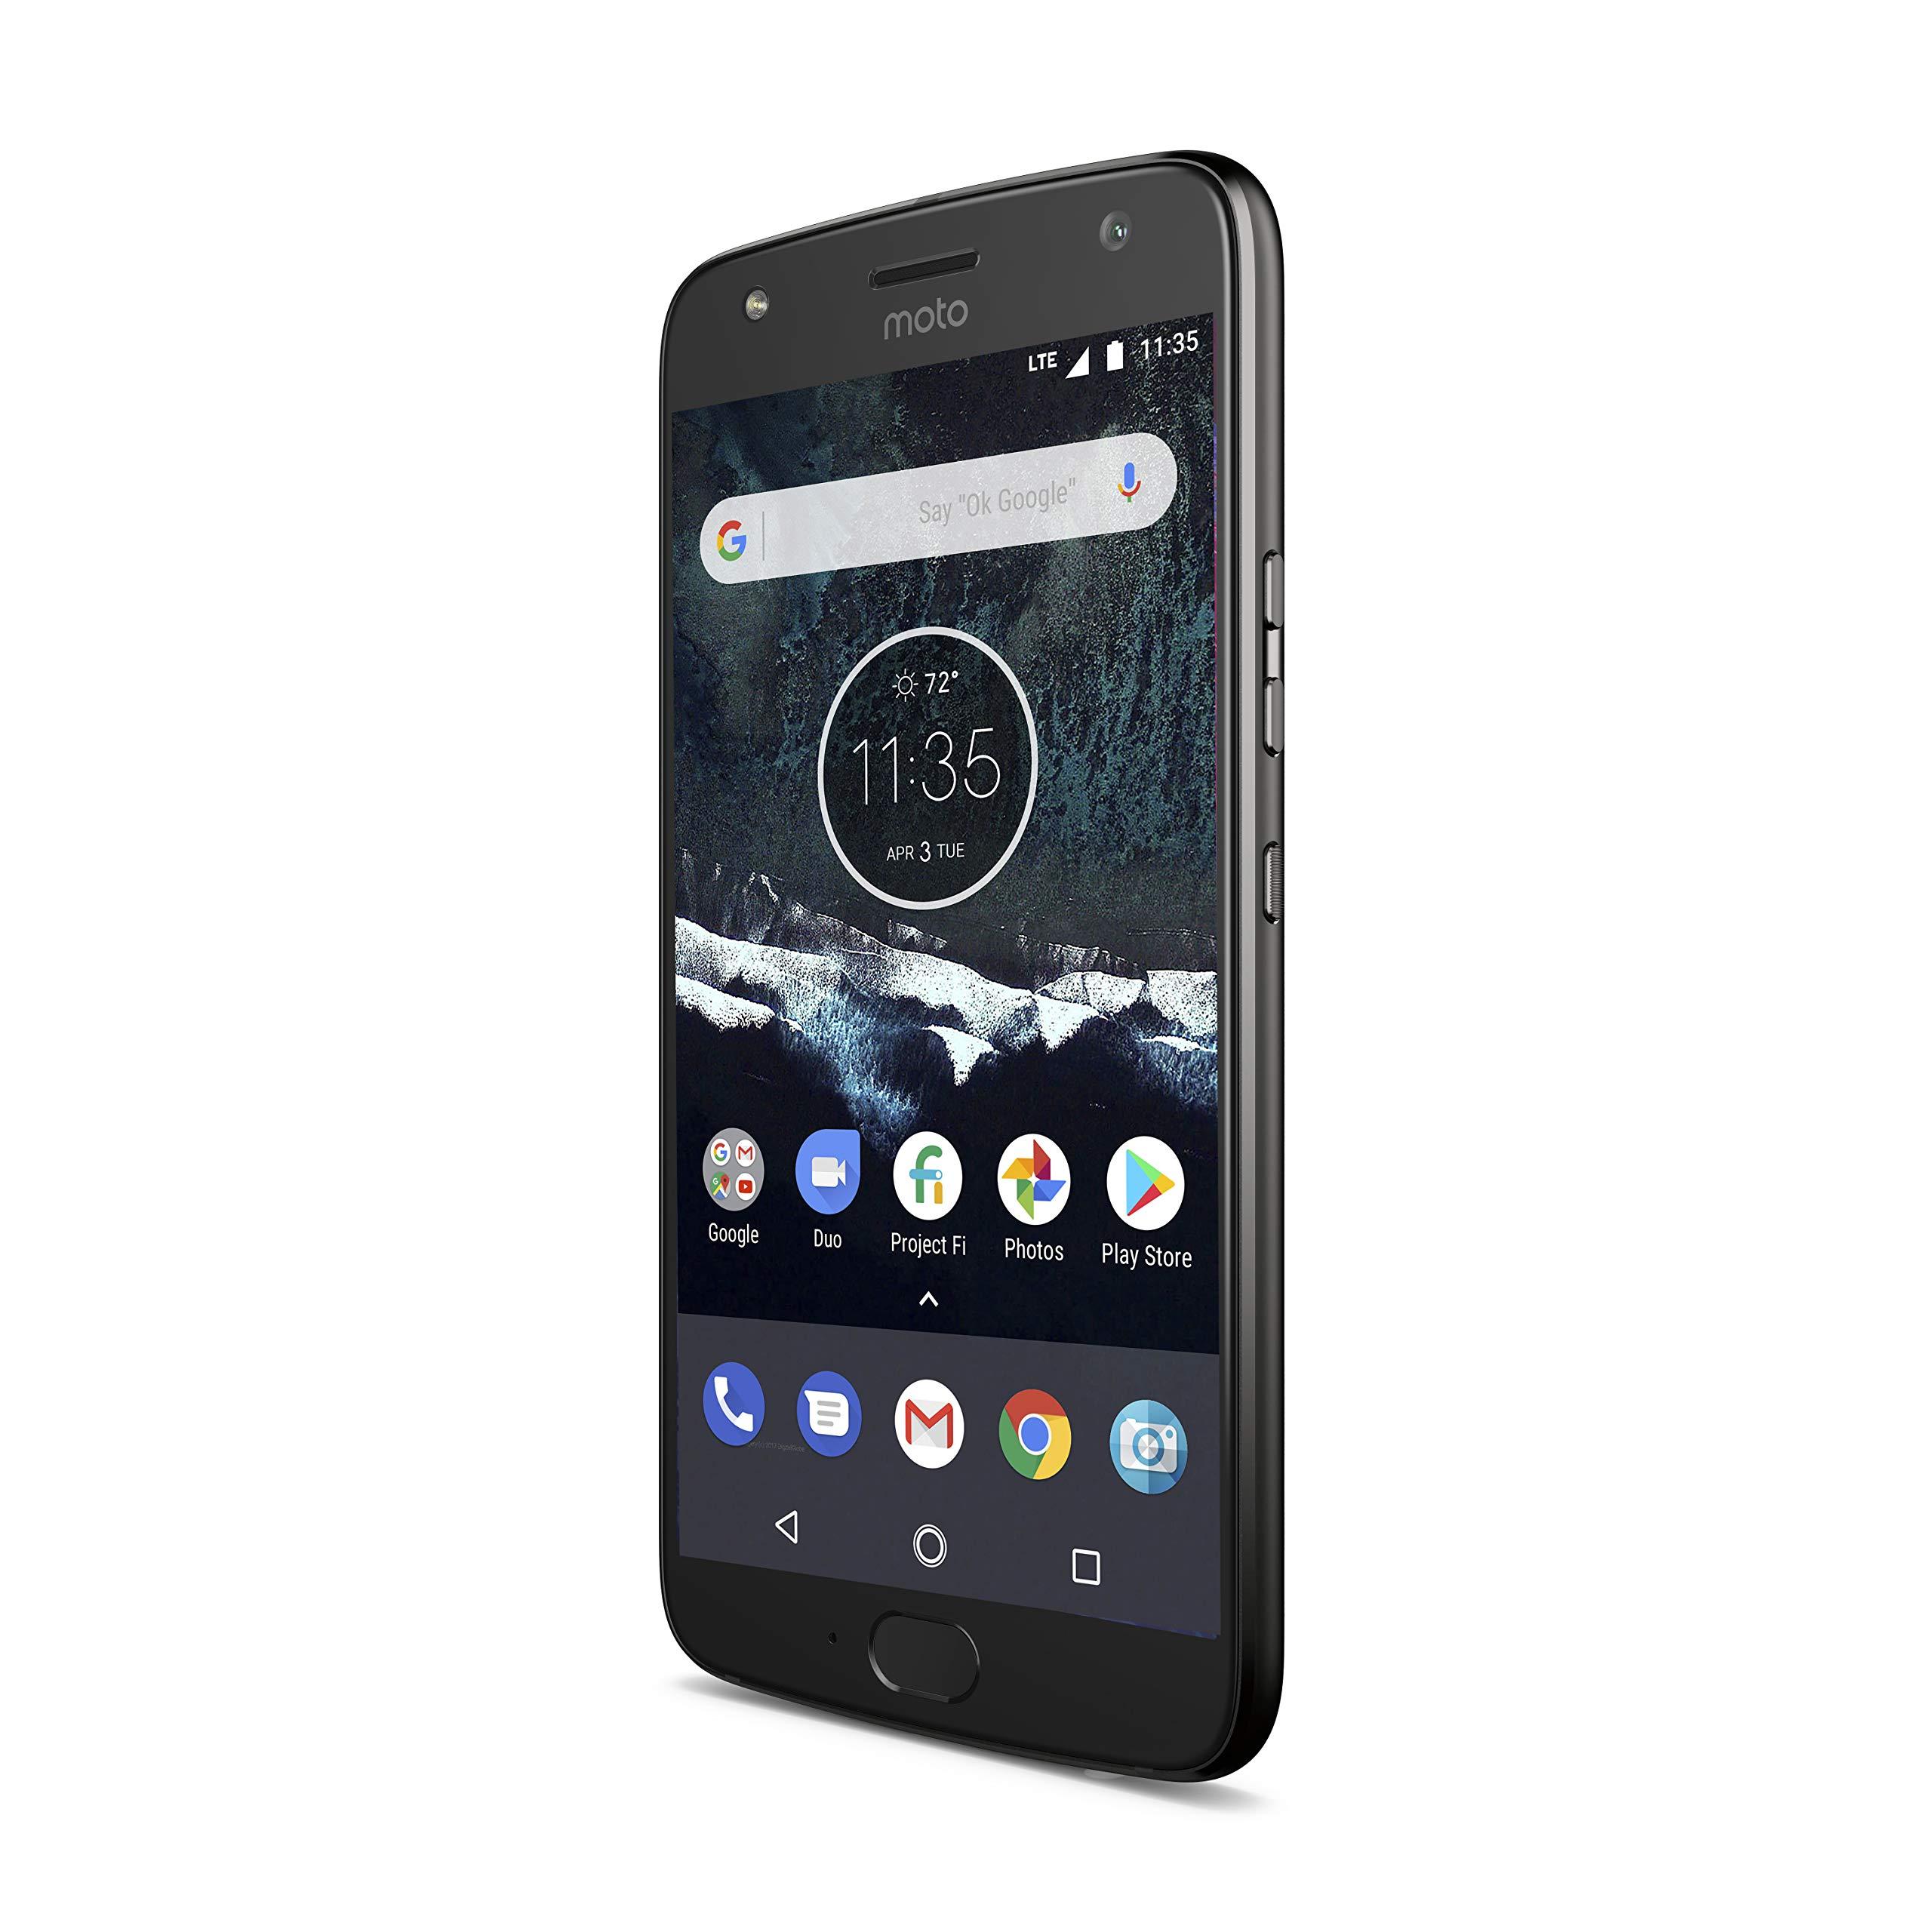 Moto X4 Android One Edition - 64GB - Black - Unlocked by Motorola (Image #3)